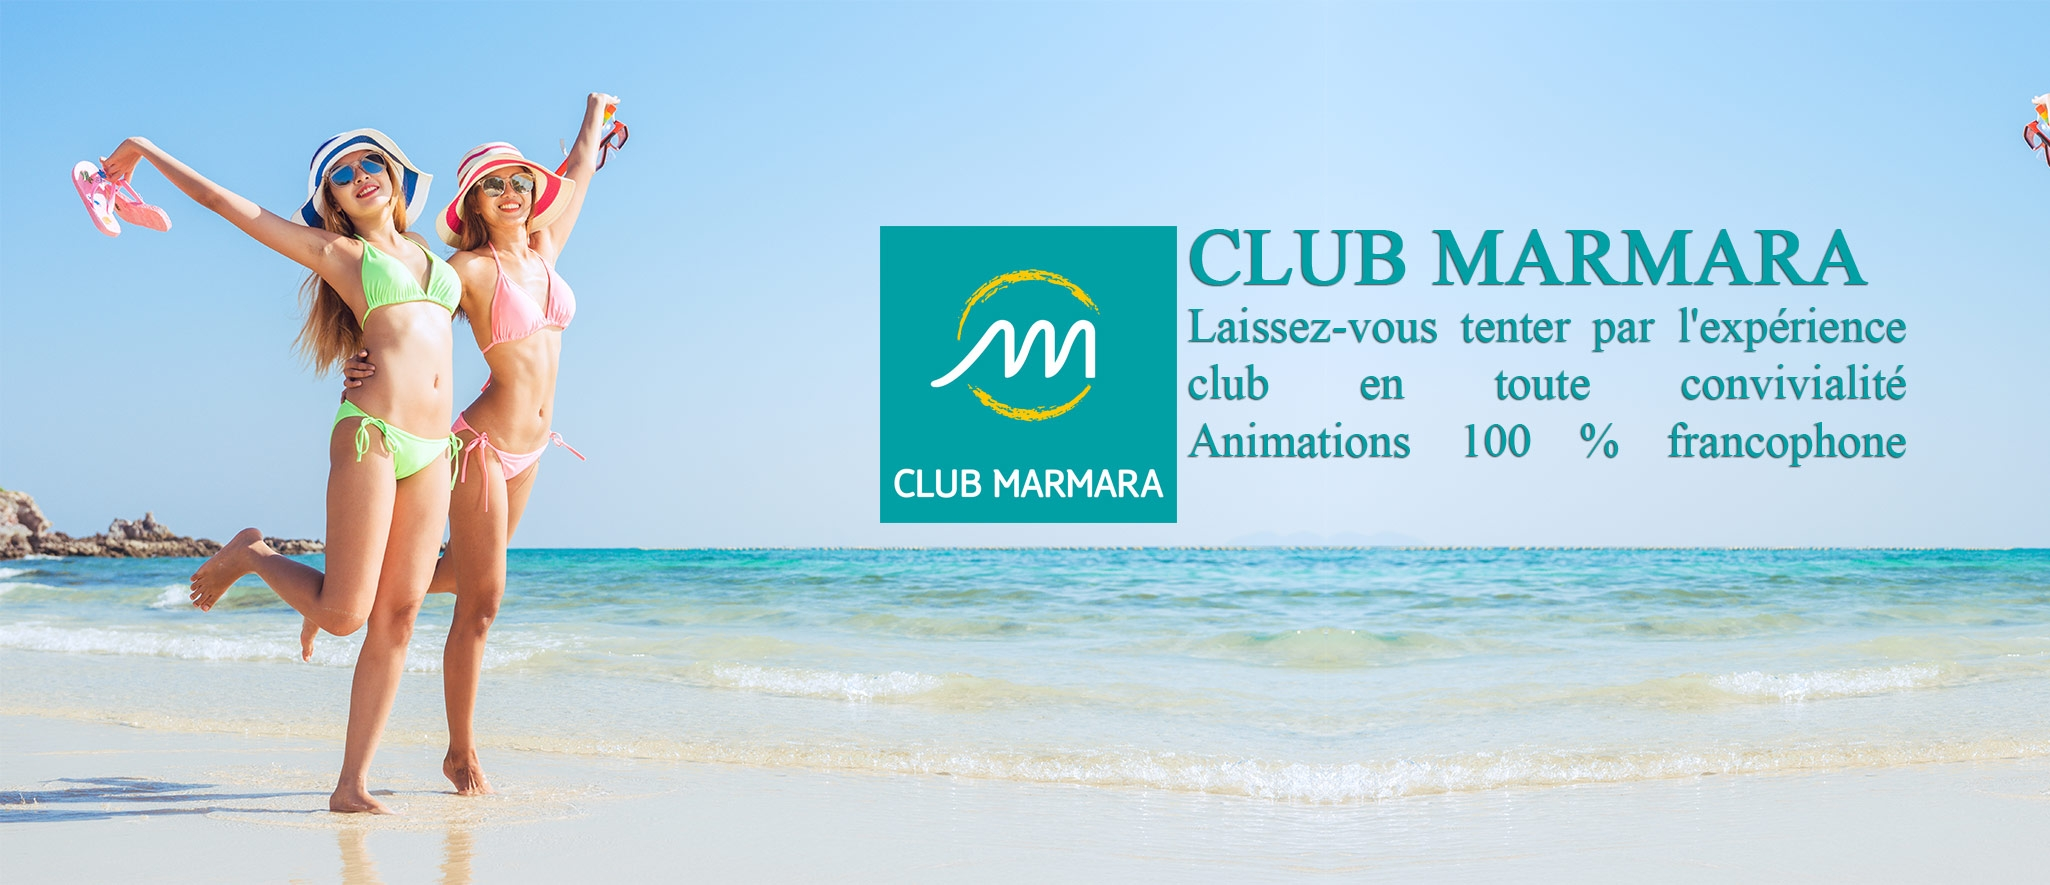 Marmara Club